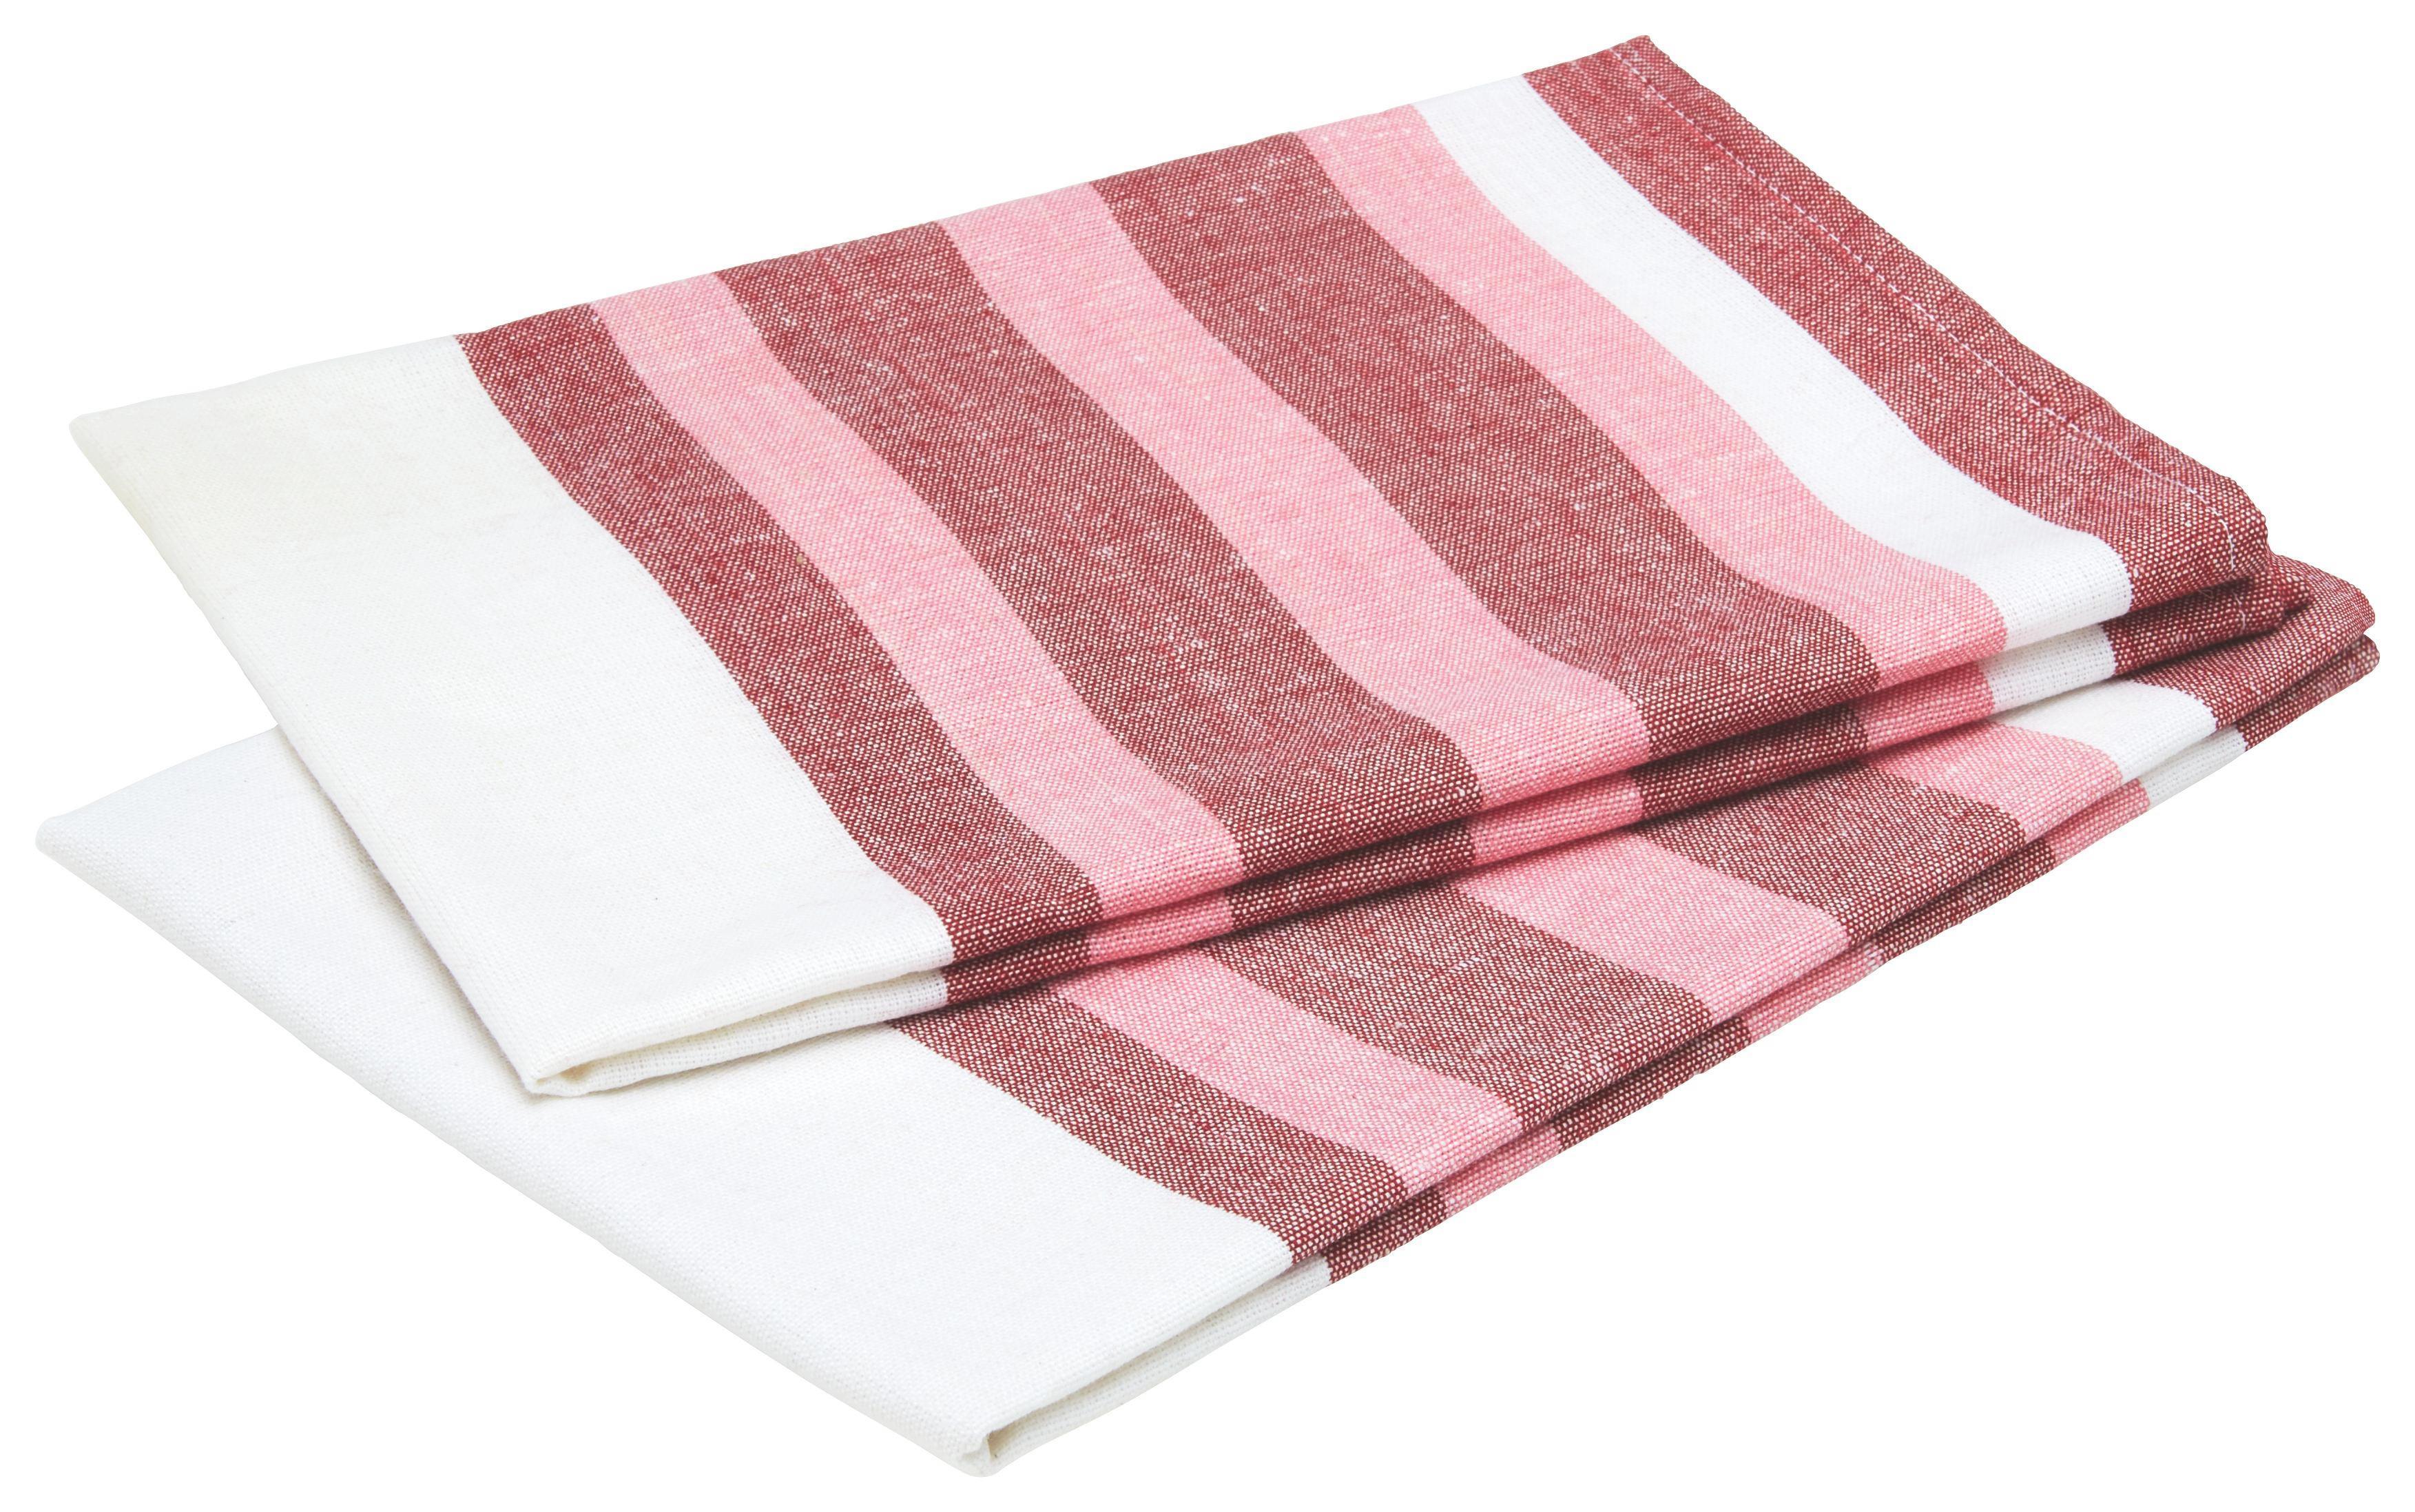 Konyharuha Streif - türkiz/piros, textil (50/70cm) - MÖMAX modern living